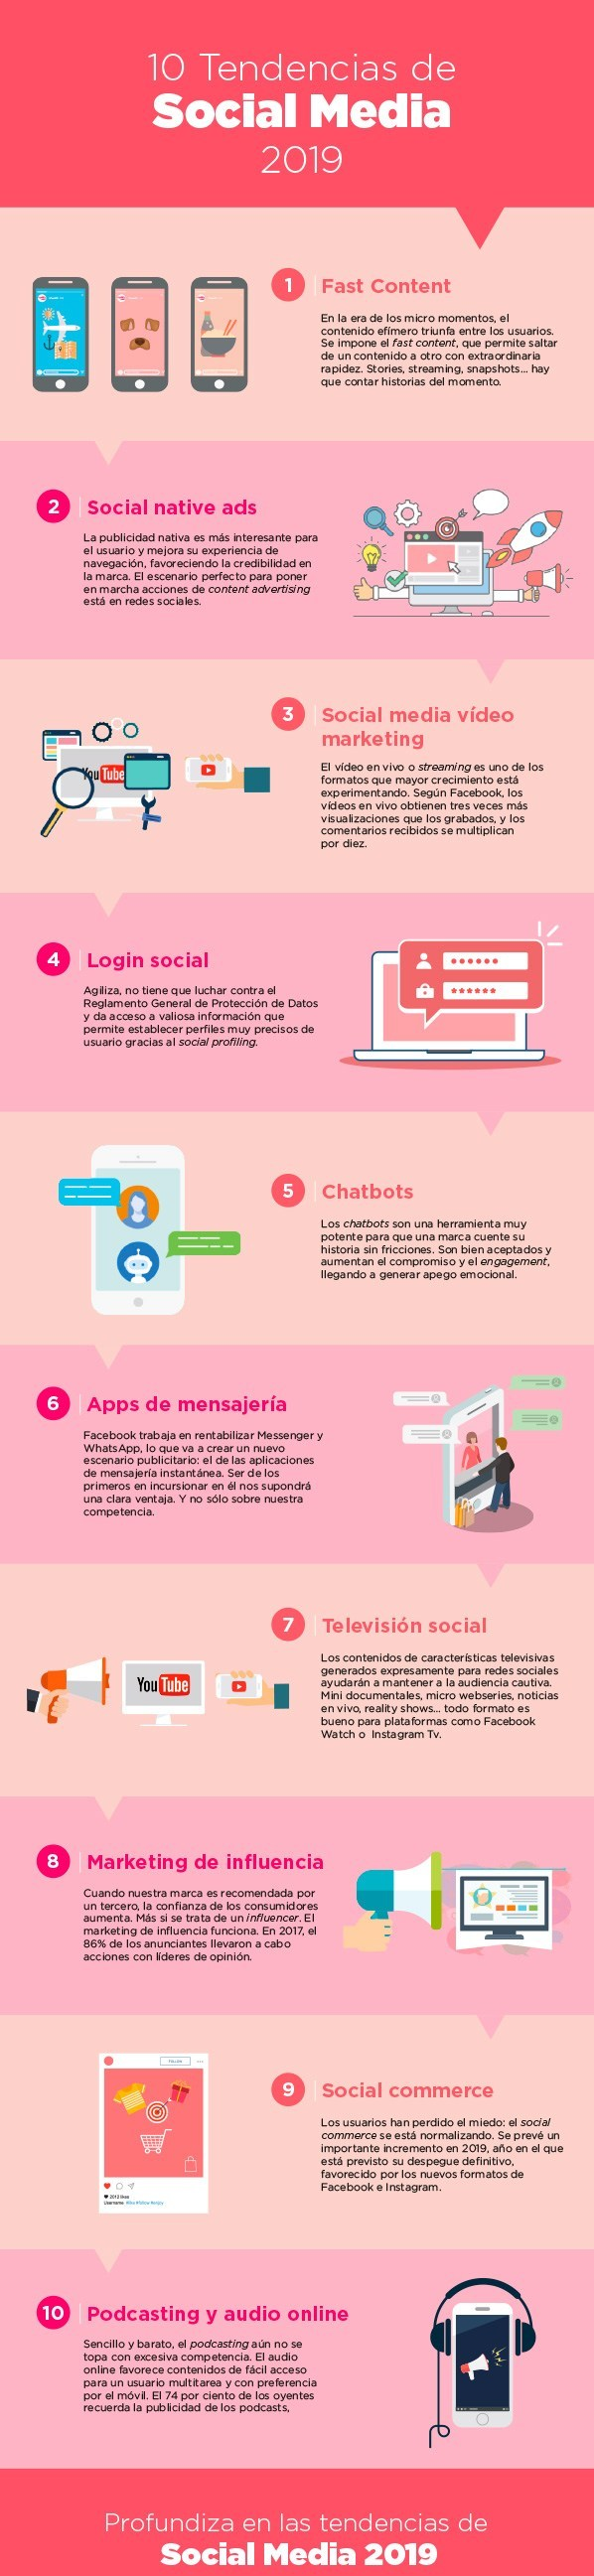 10 tendencias Social Media 2019 #infografia #infographic #socialmedia